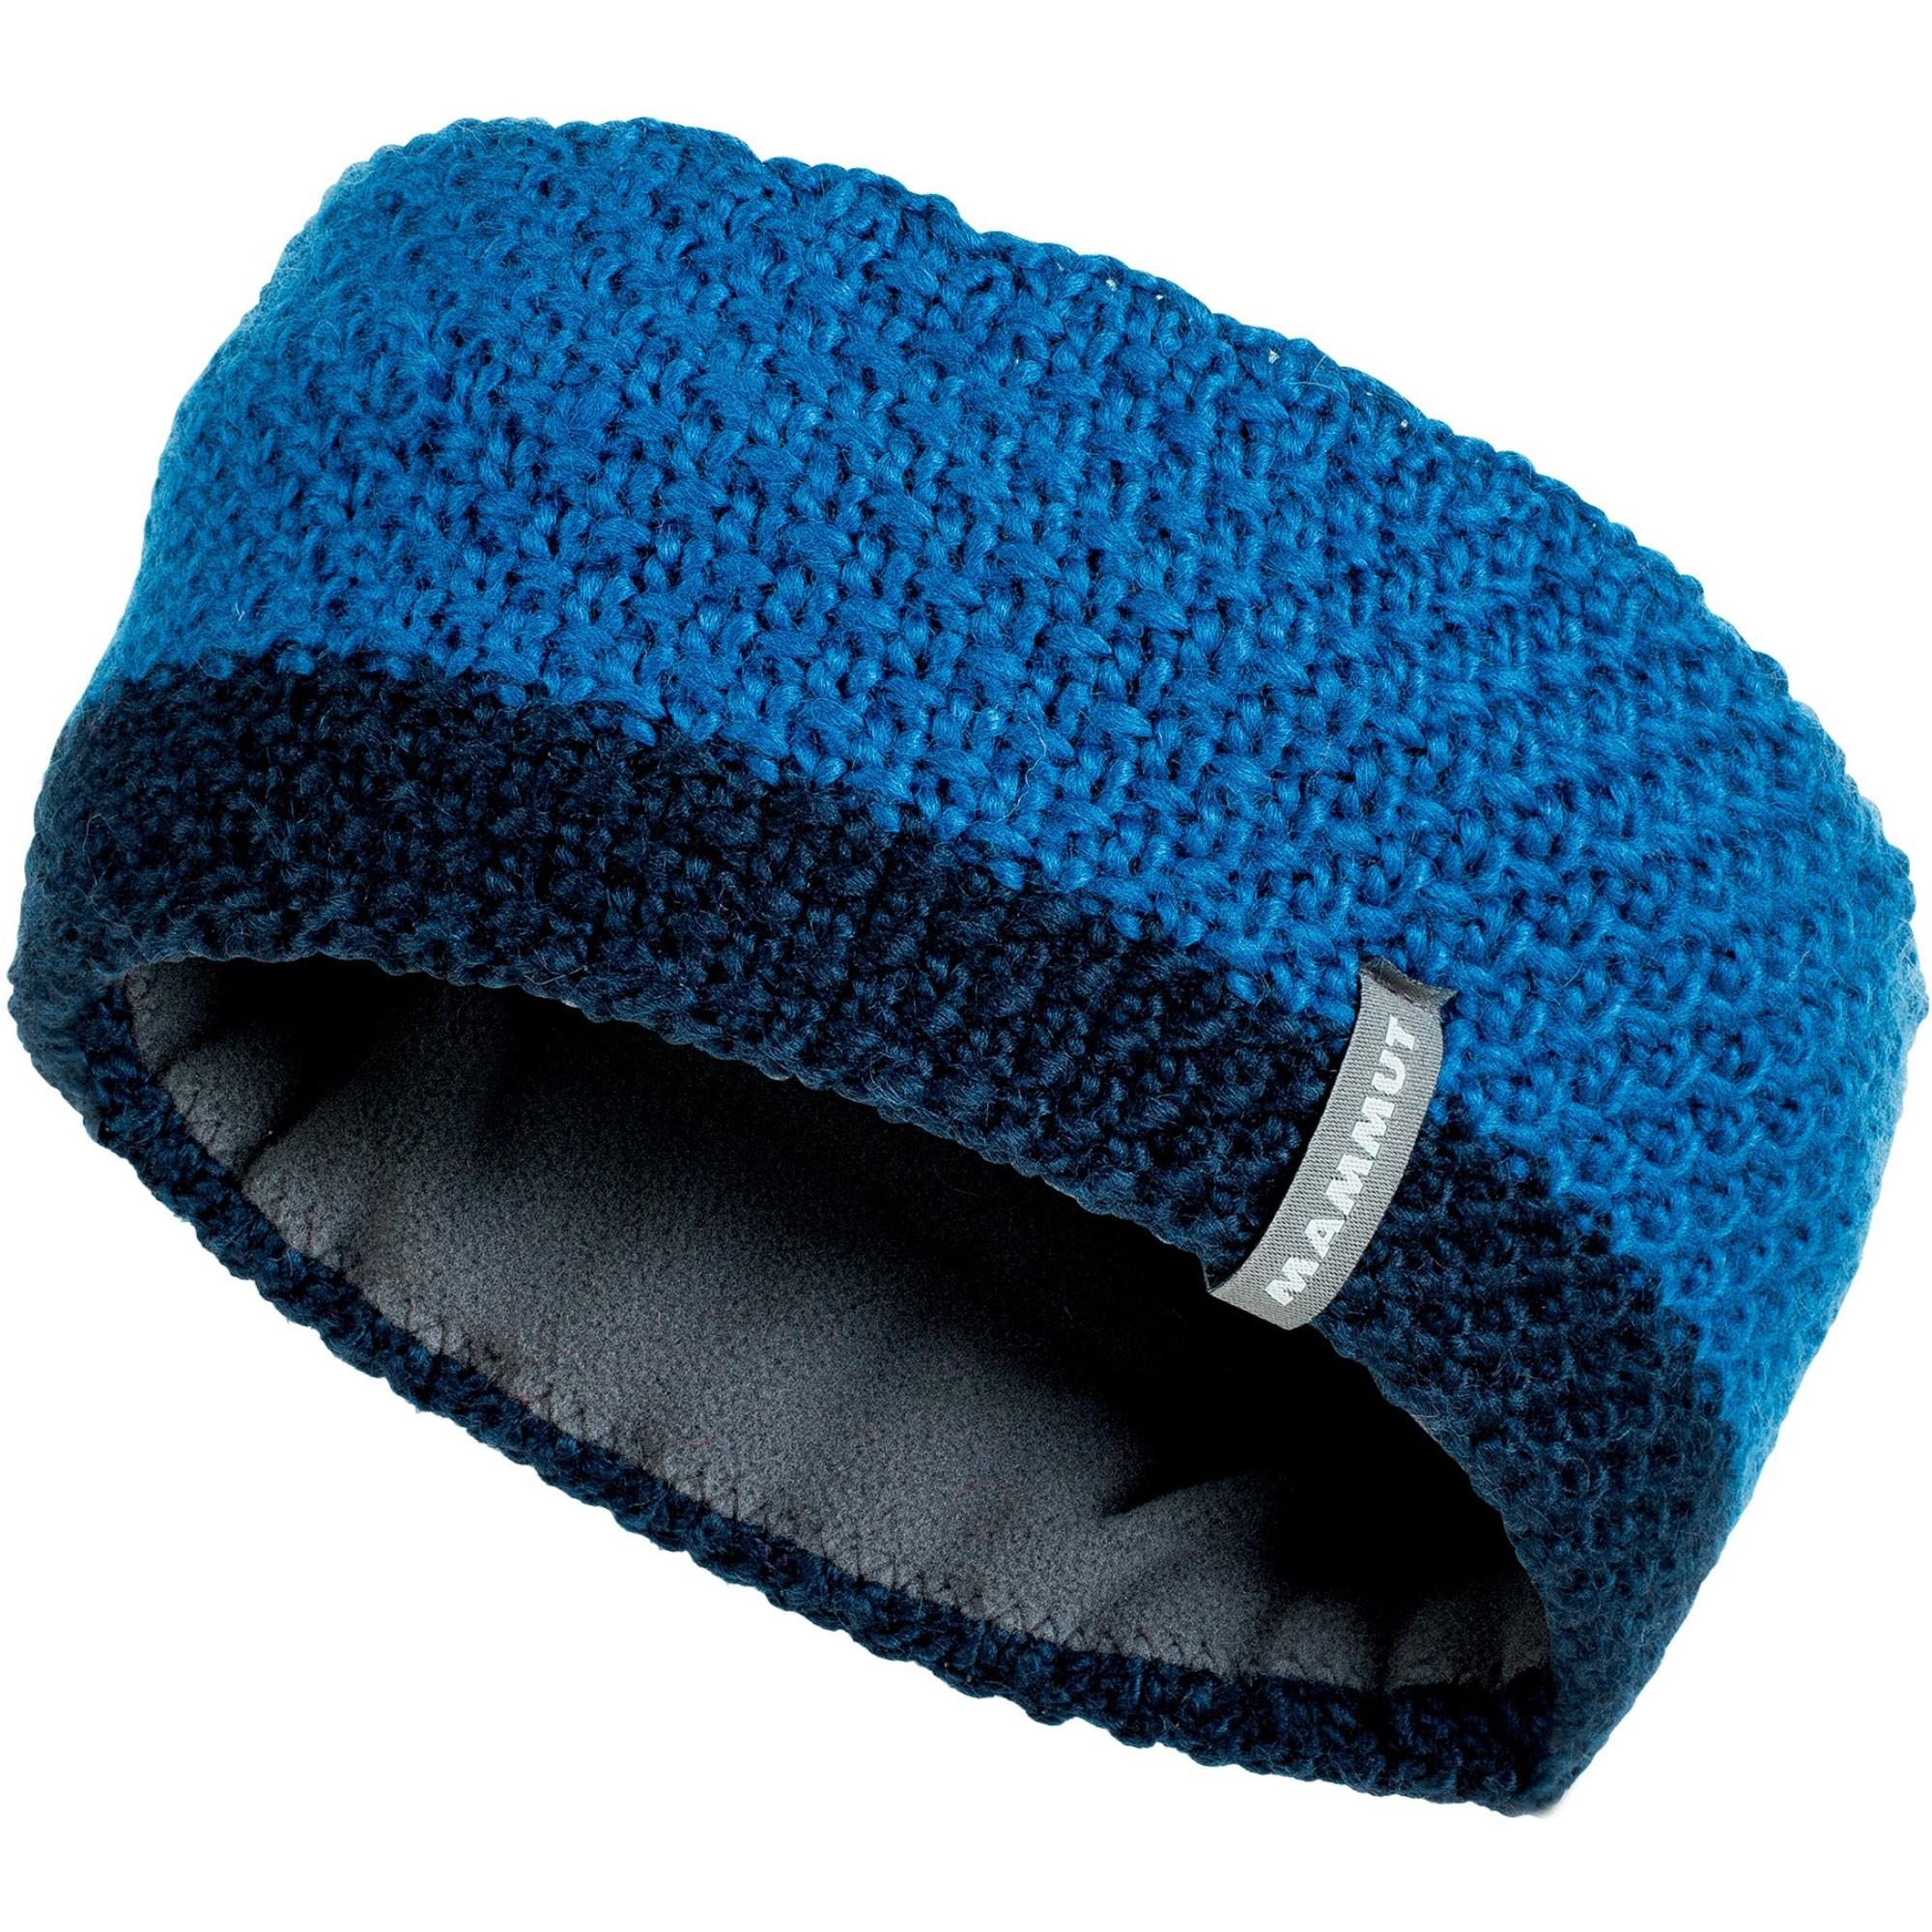 Mammut Alyeska Headband - Ultramarine/Imperial